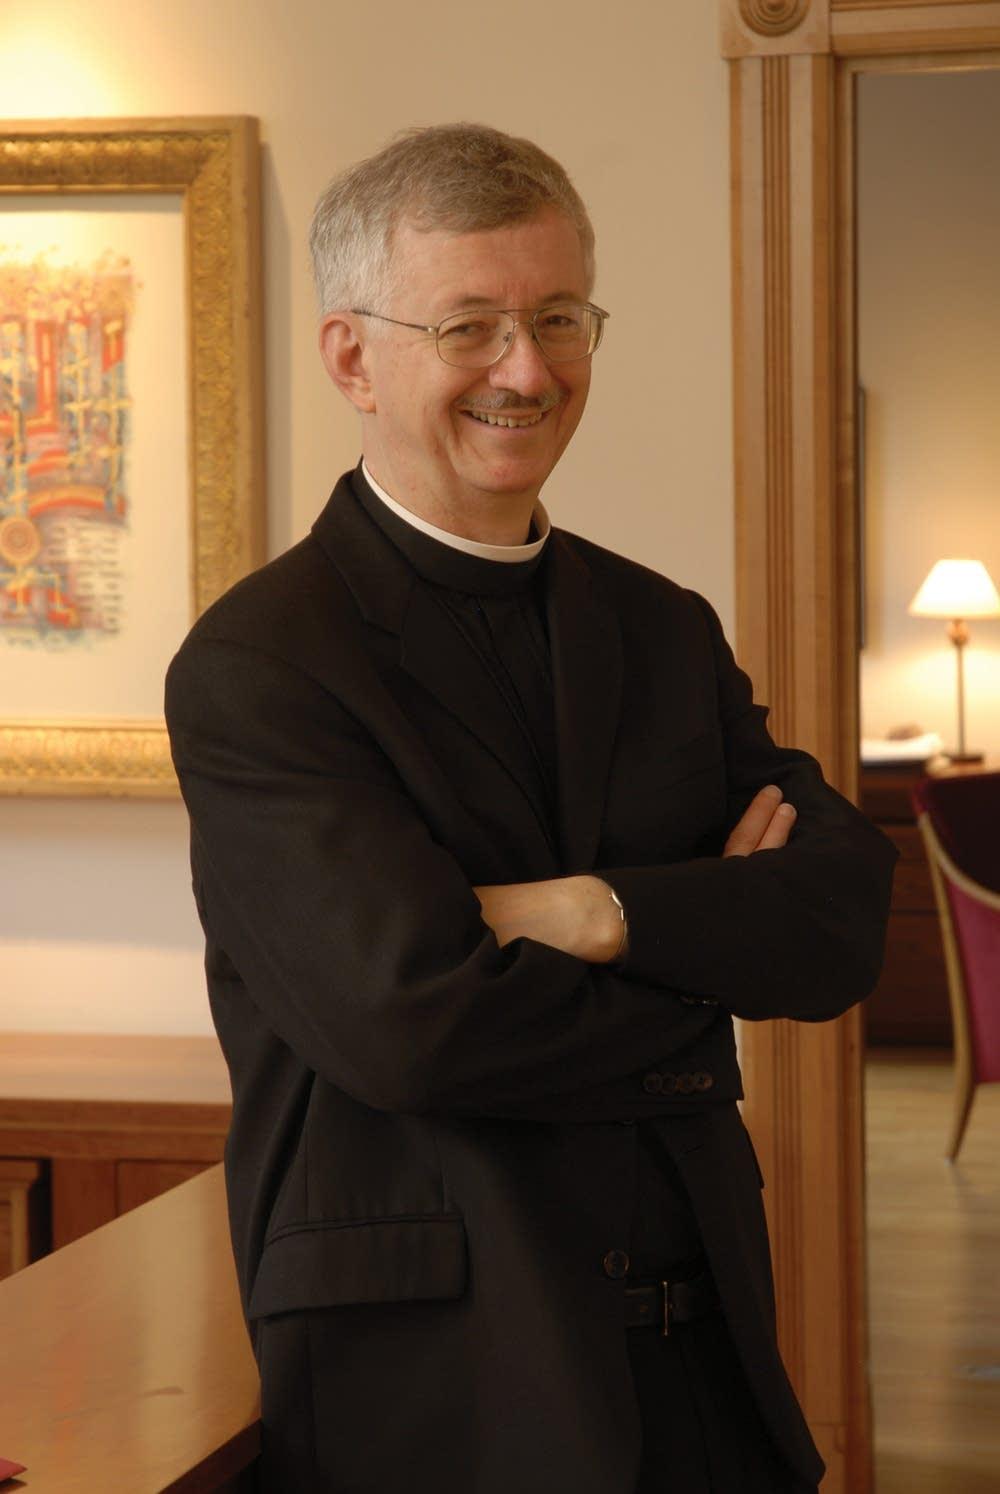 Brother Dietrich